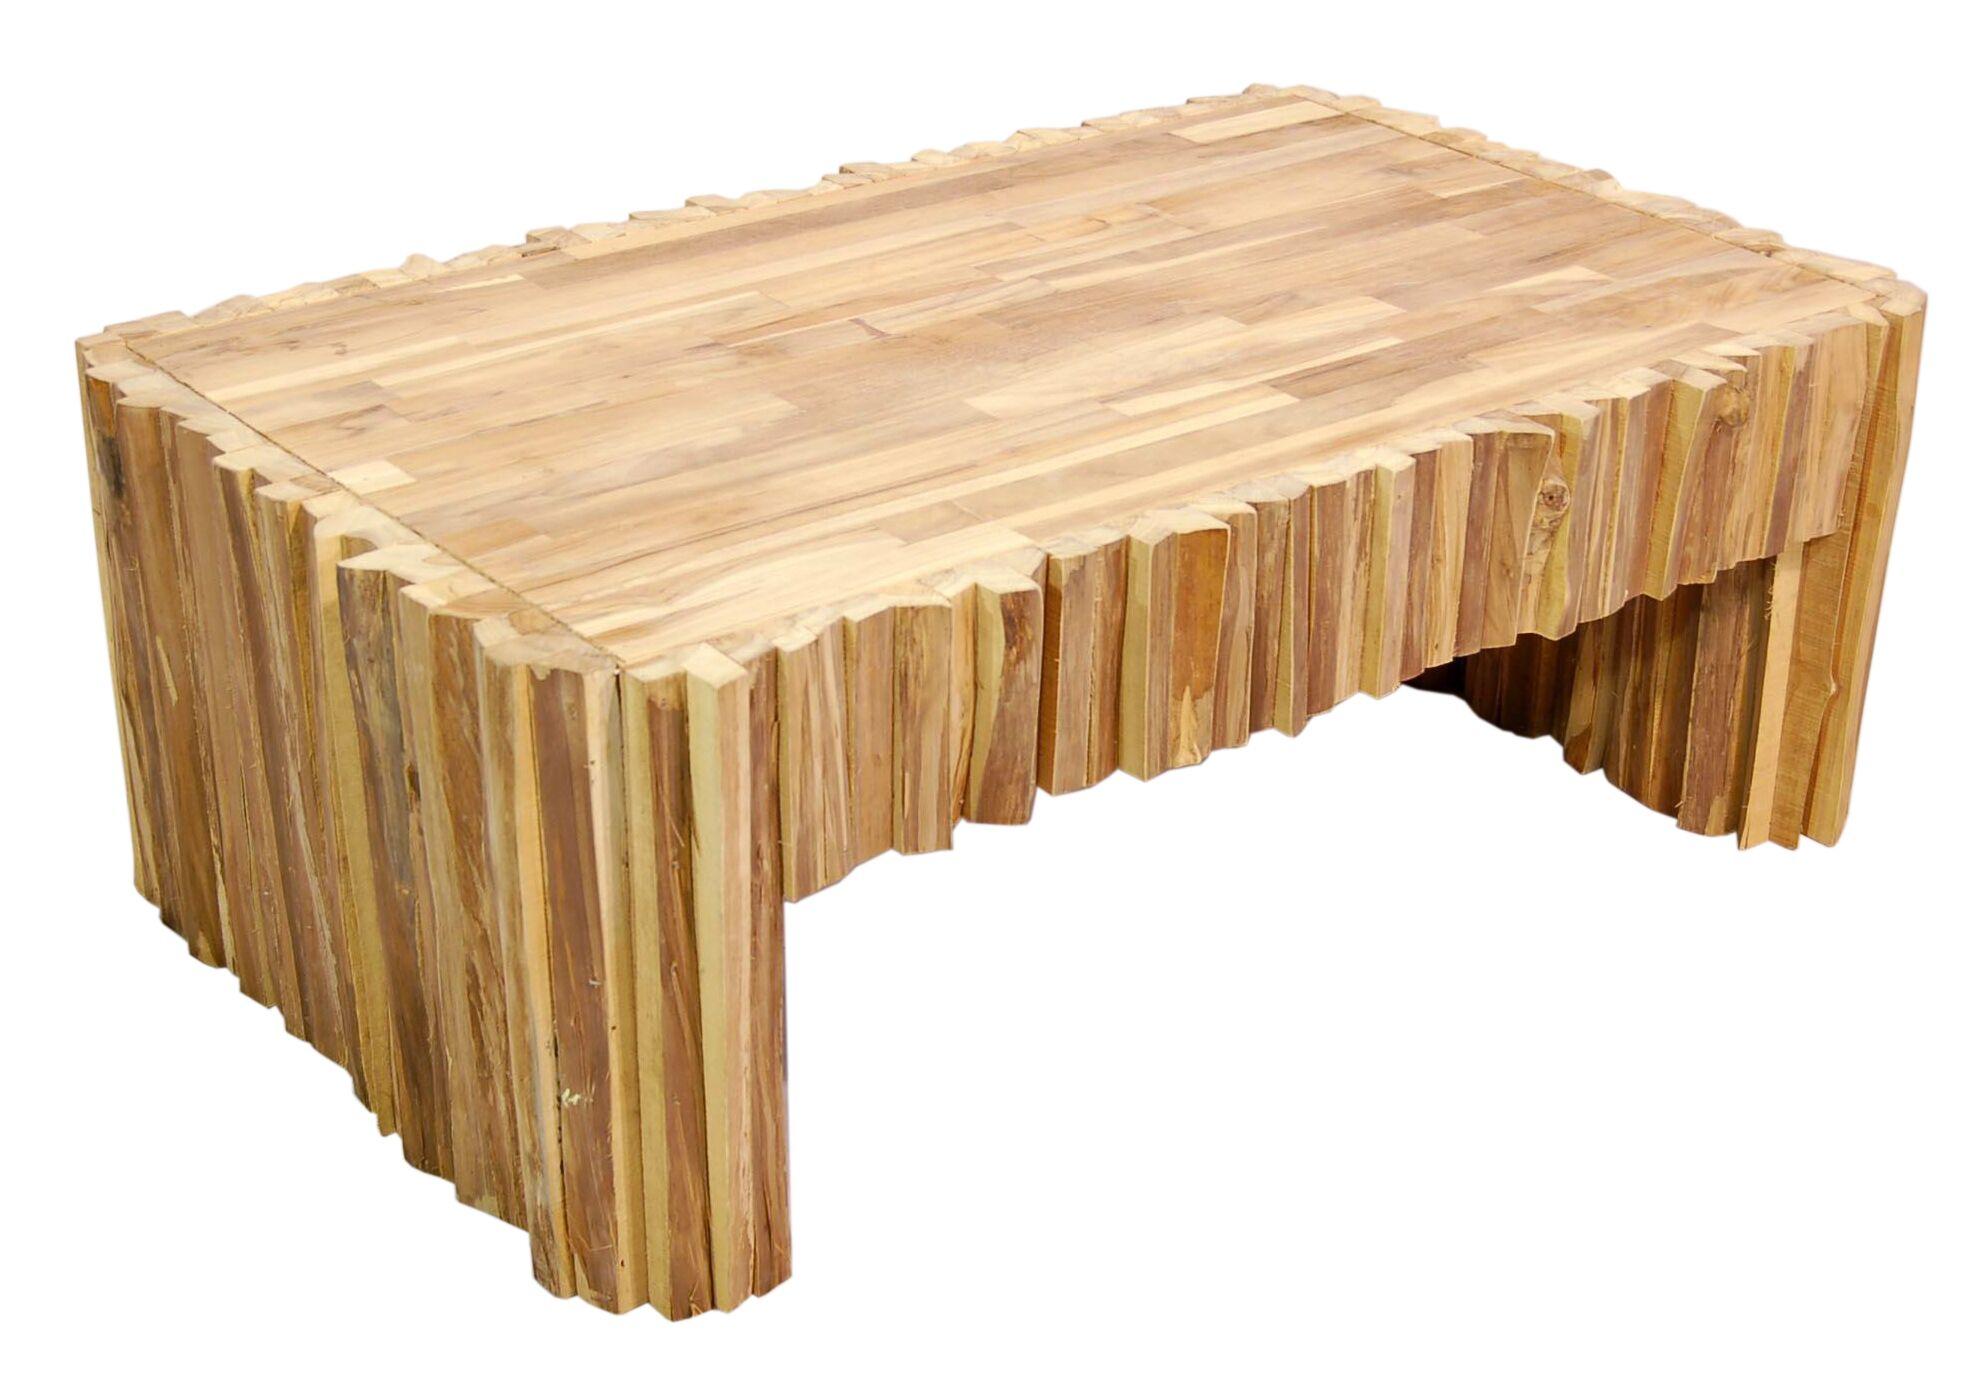 Obi Coffee Table Size: 51 x 30 x 16